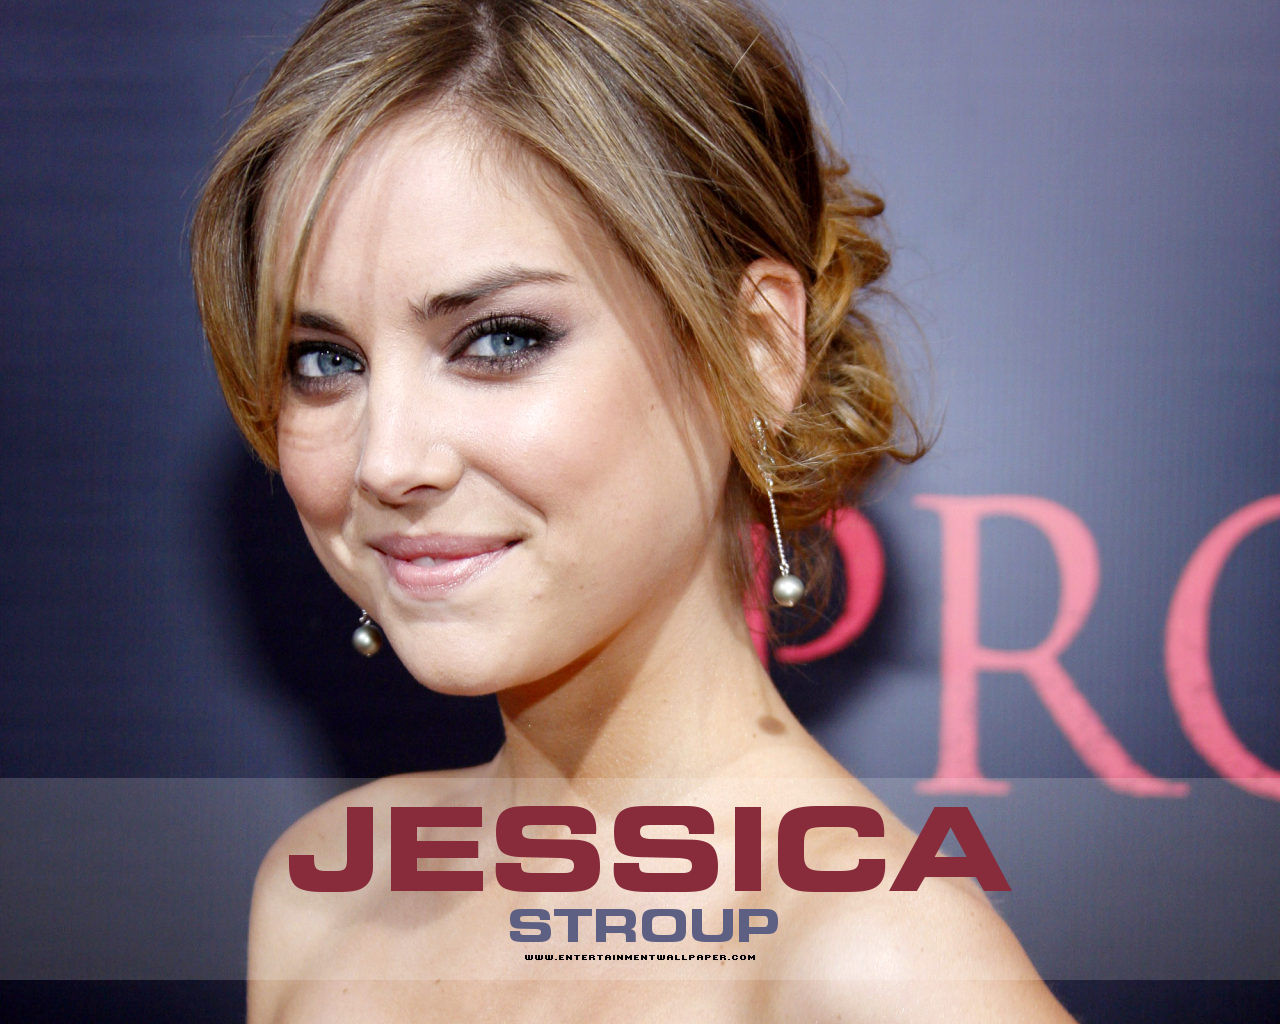 Silver =) - Jessica Stroup Photo (5963116) - Fanpop